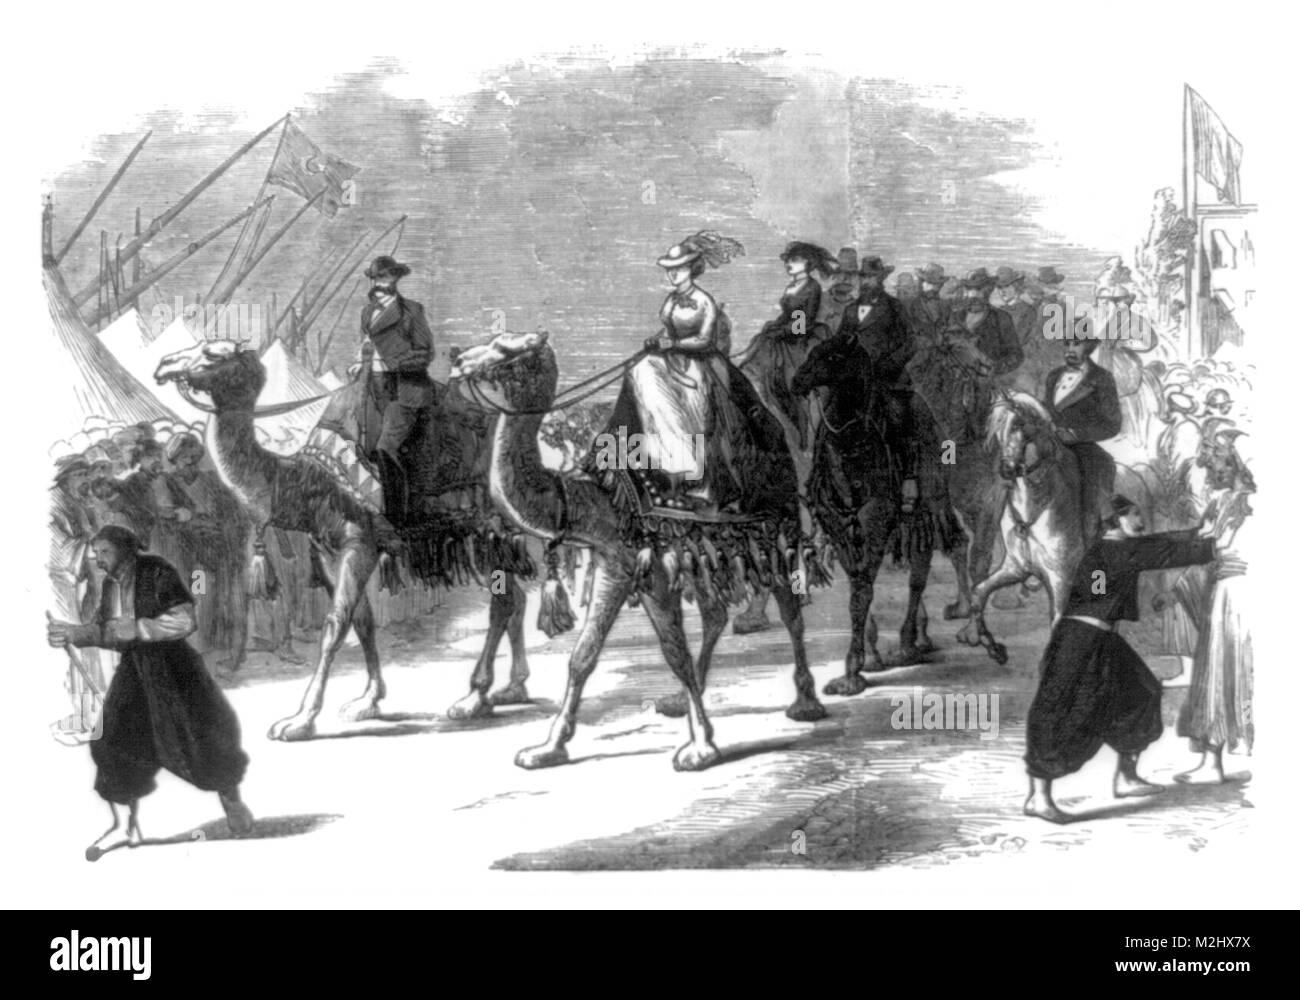 Opening of Suez Canal, Empress Eugenie, 1869 - Stock Image